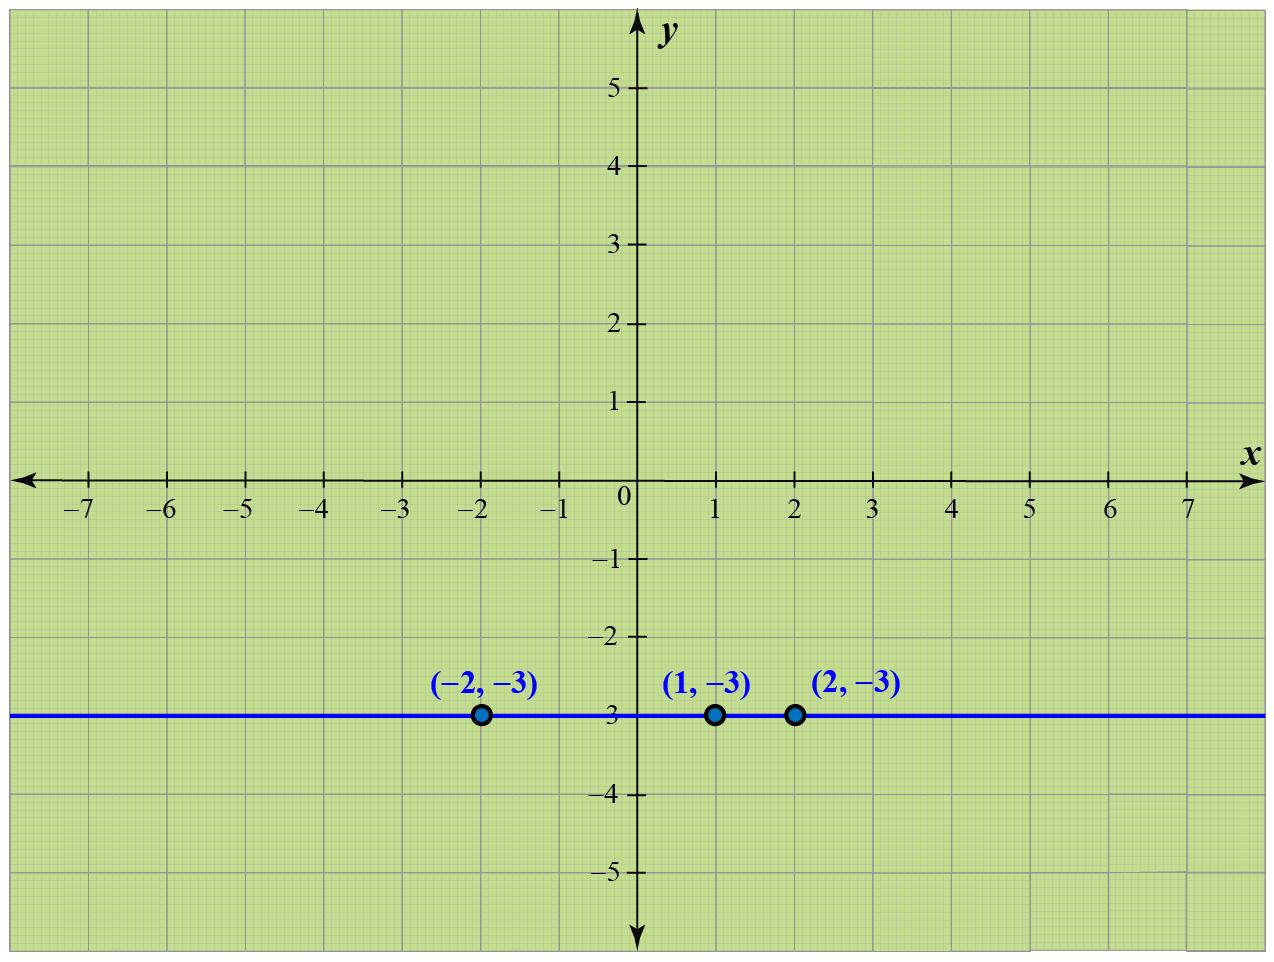 How to make a horizontal line on a coordinate plane?